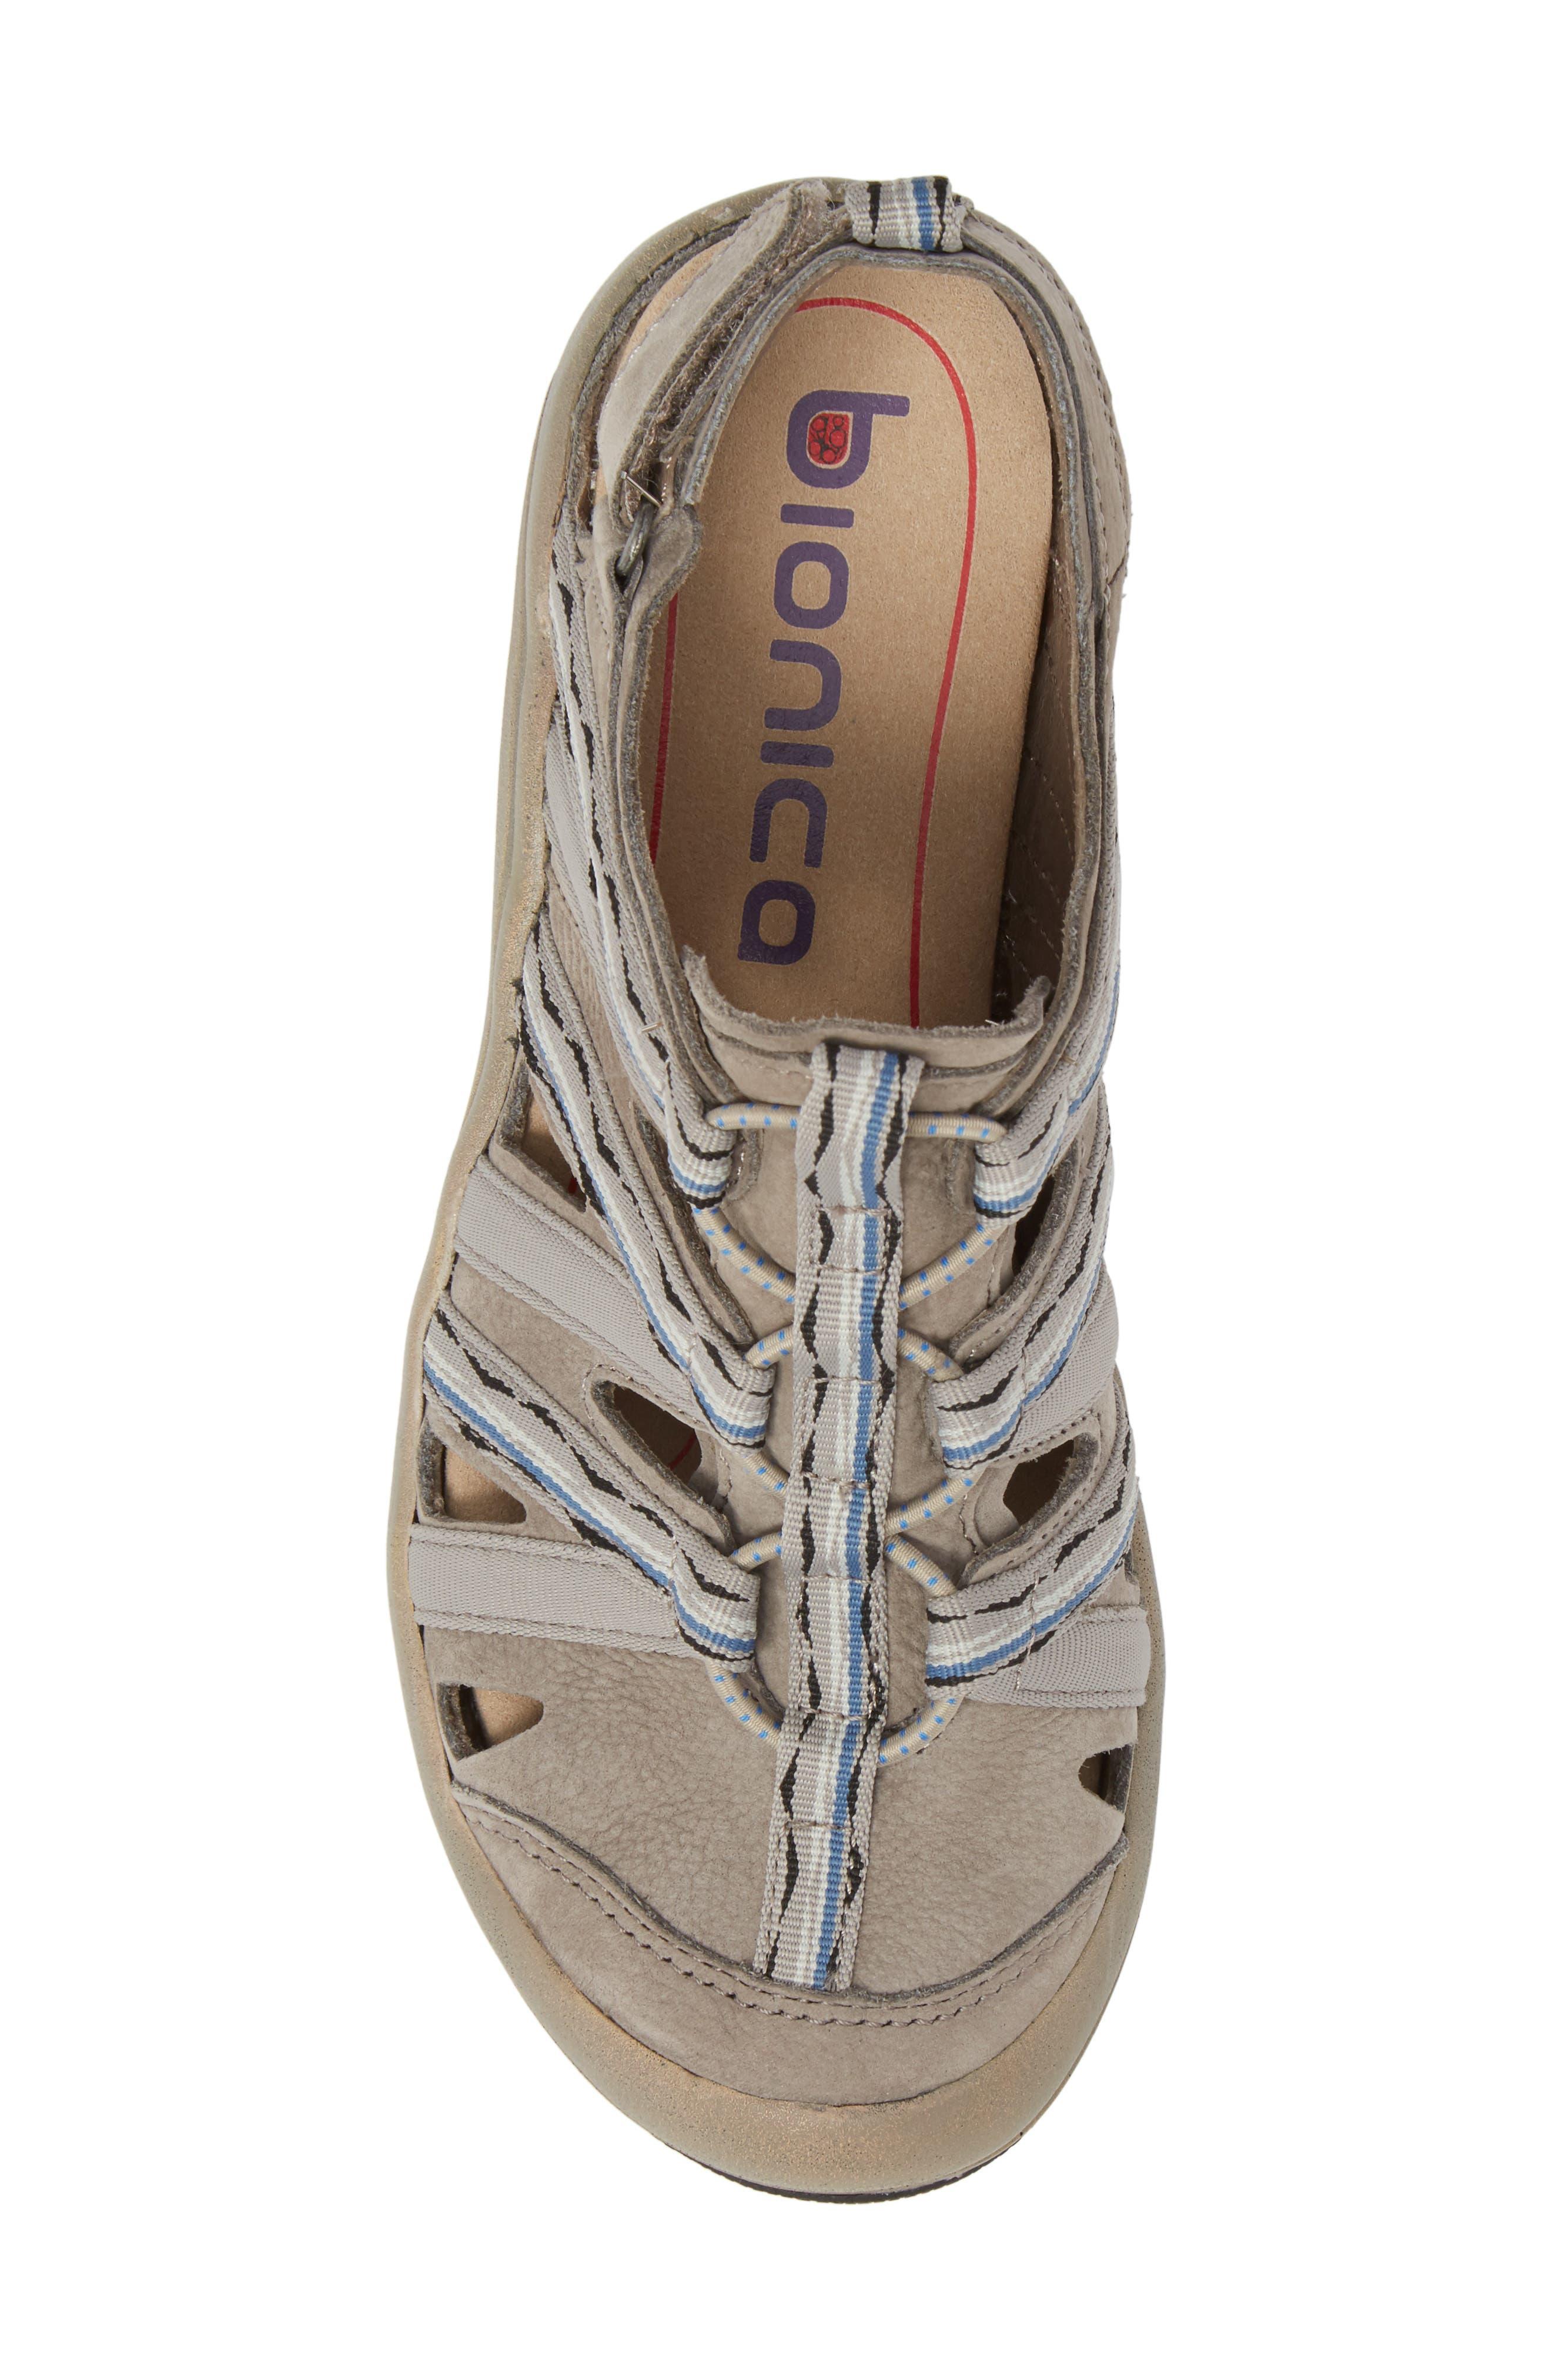 Malabar Sport Sandal,                             Alternate thumbnail 5, color,                             Paper Mache Leather